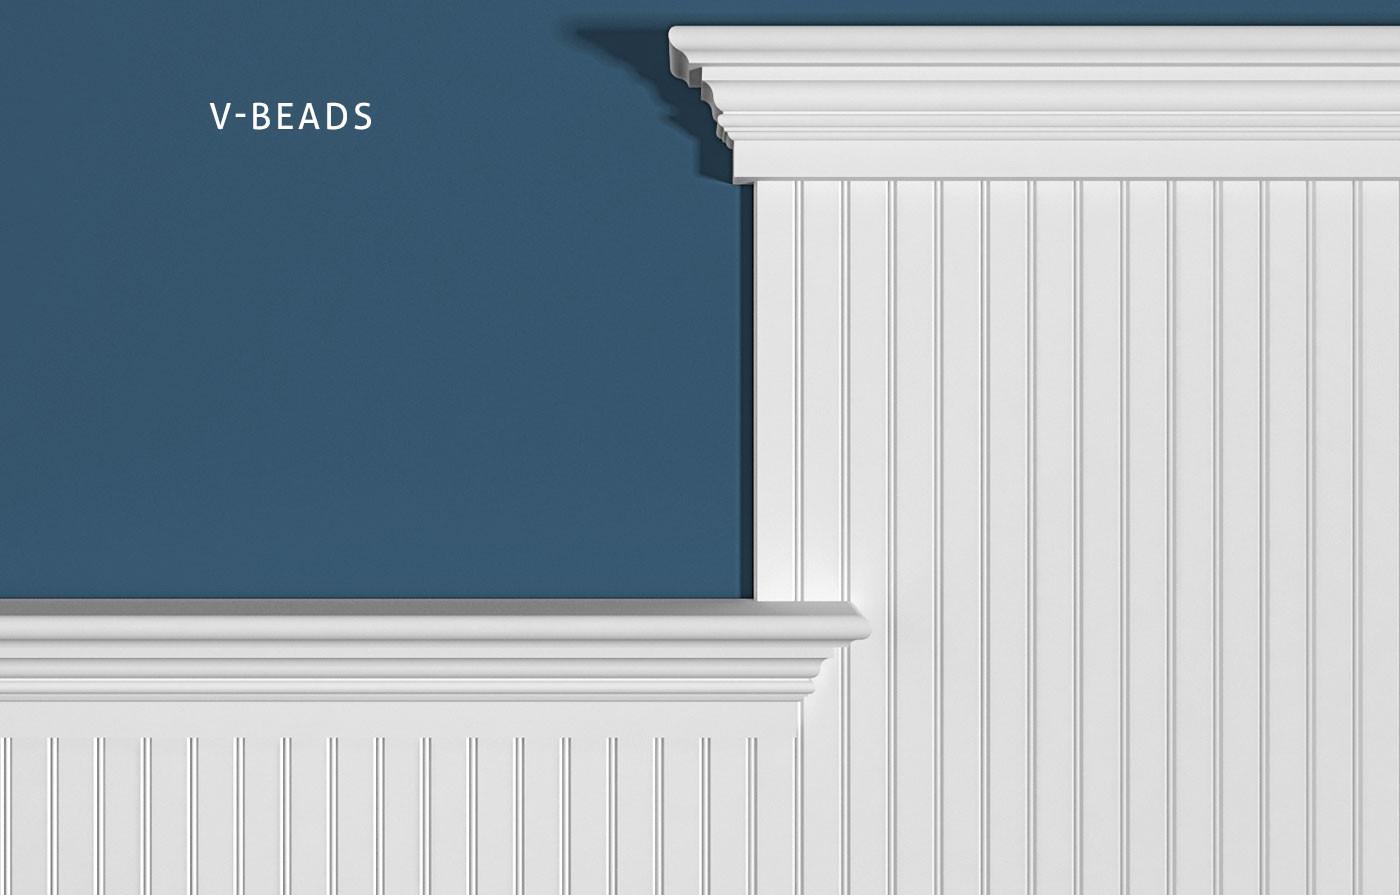 1-5/8 Inch On Center V-Bead, PLC634 Crown, Cap Combination: 1x4, SC214, FS312